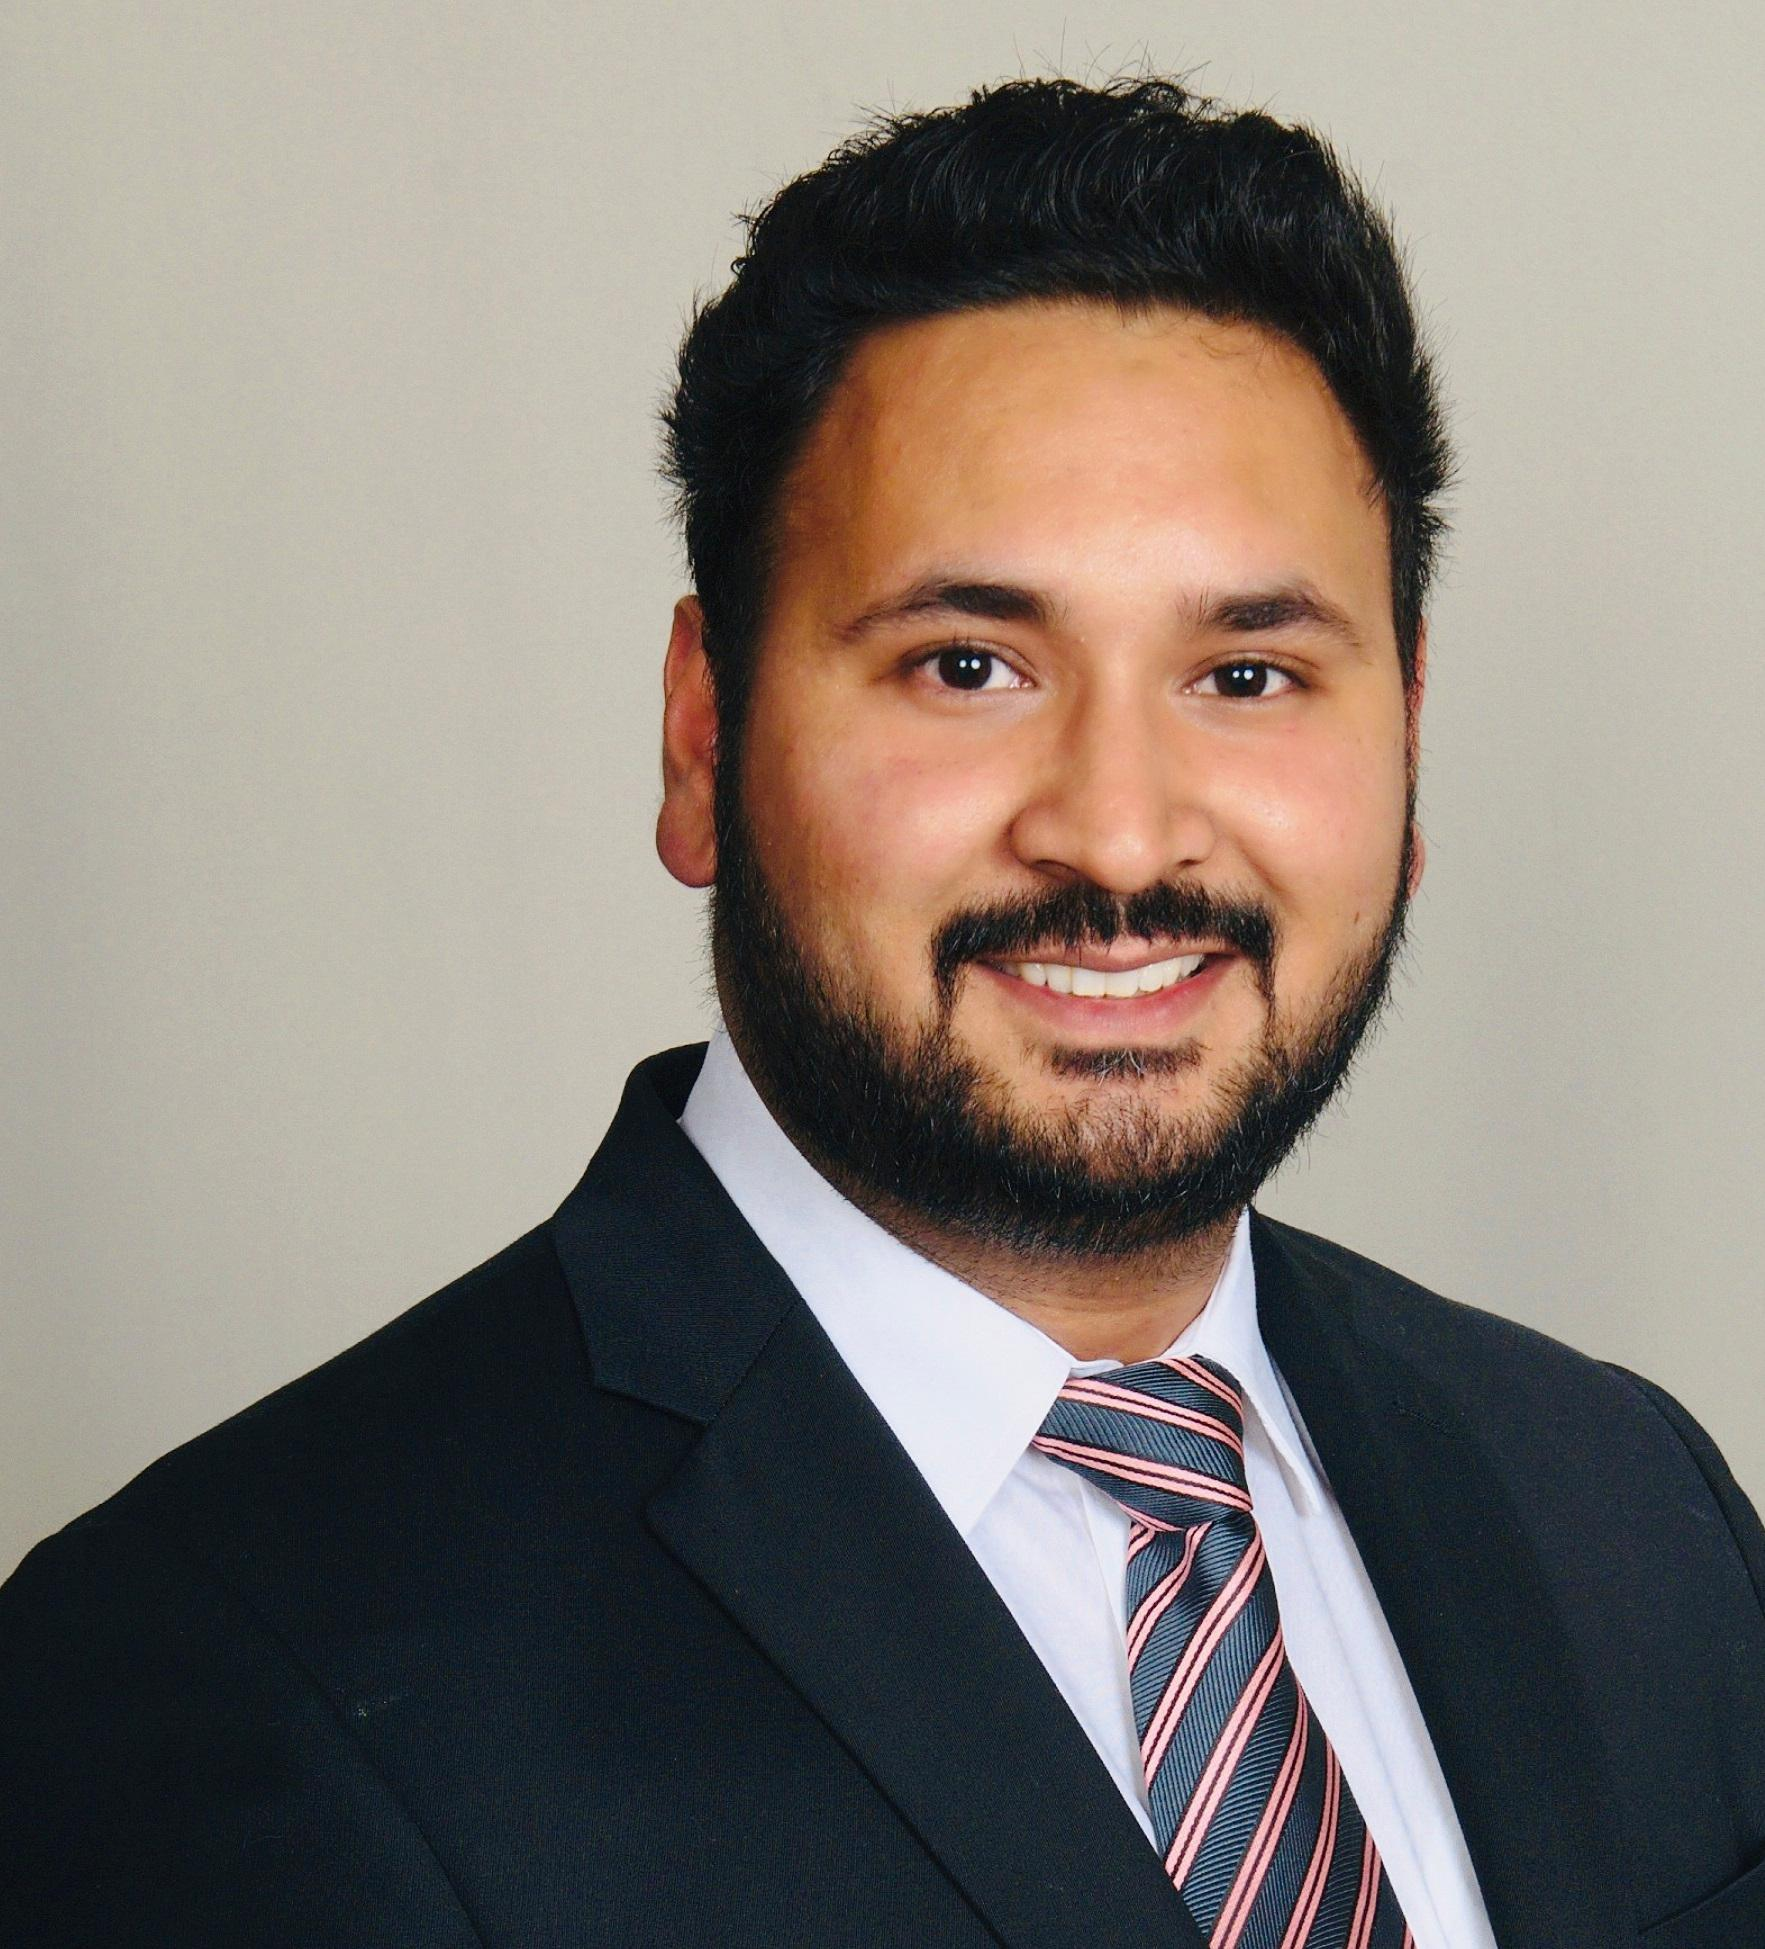 YADWINDER SINGH CHEHIL Financial Professional & Insurance Agent